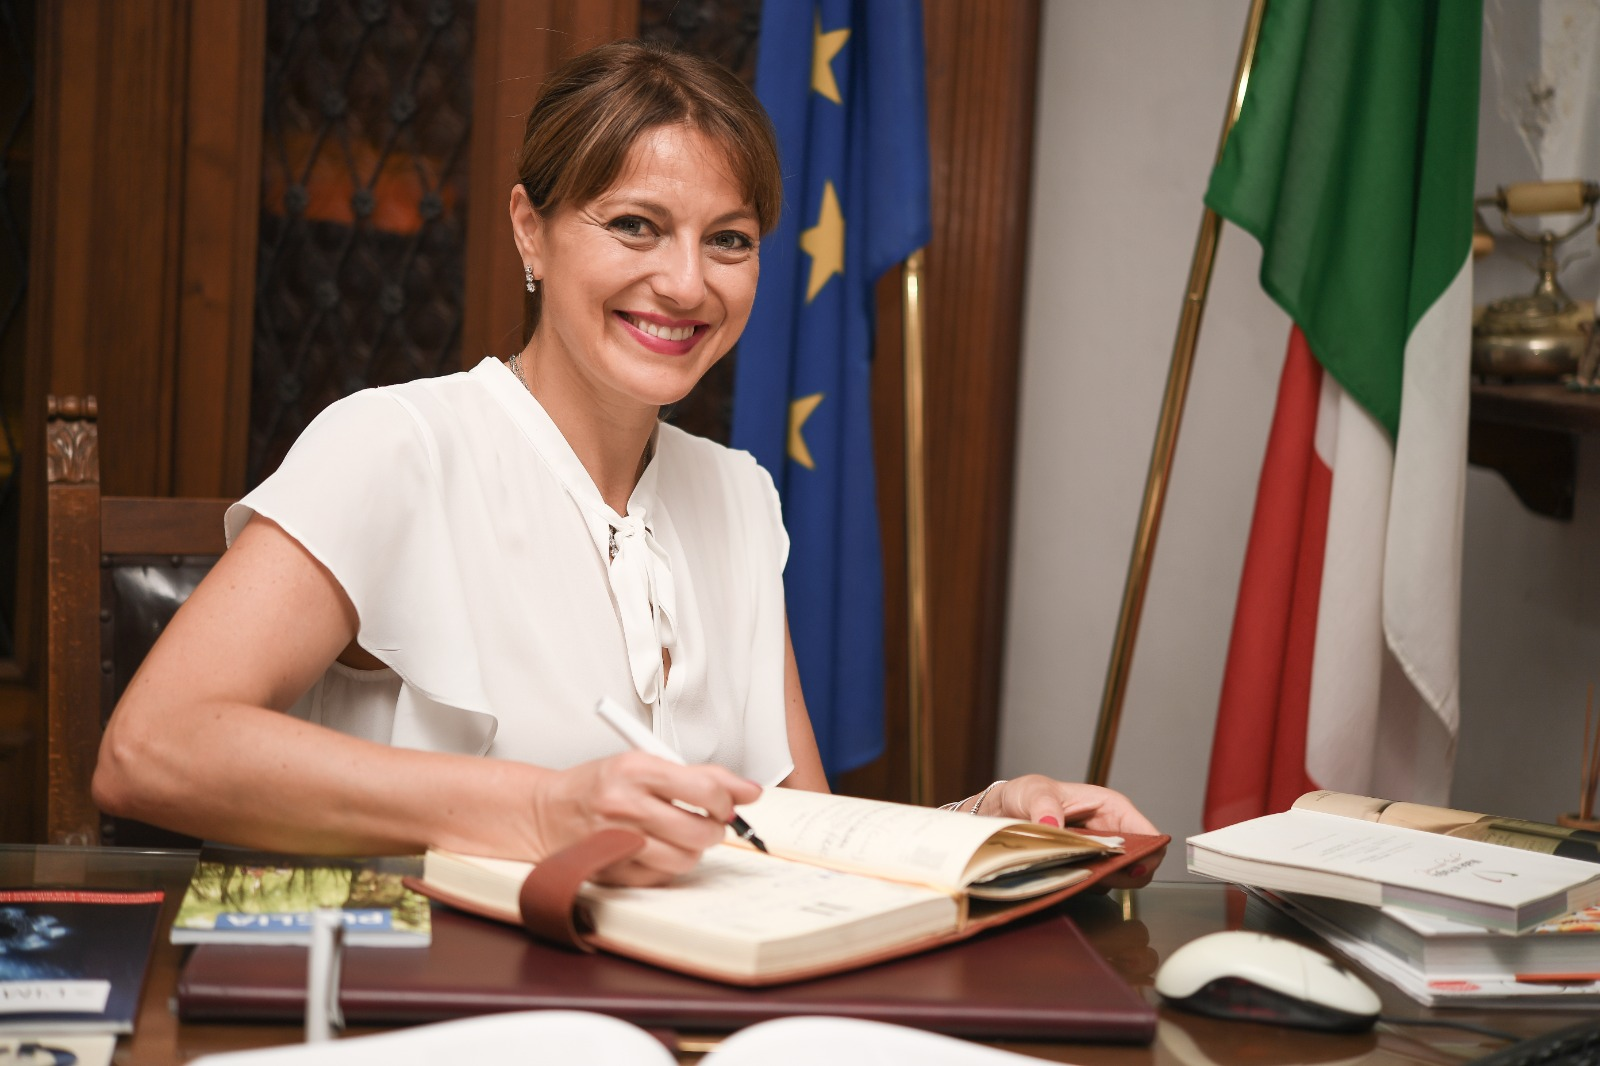 Beatrice Lucarella